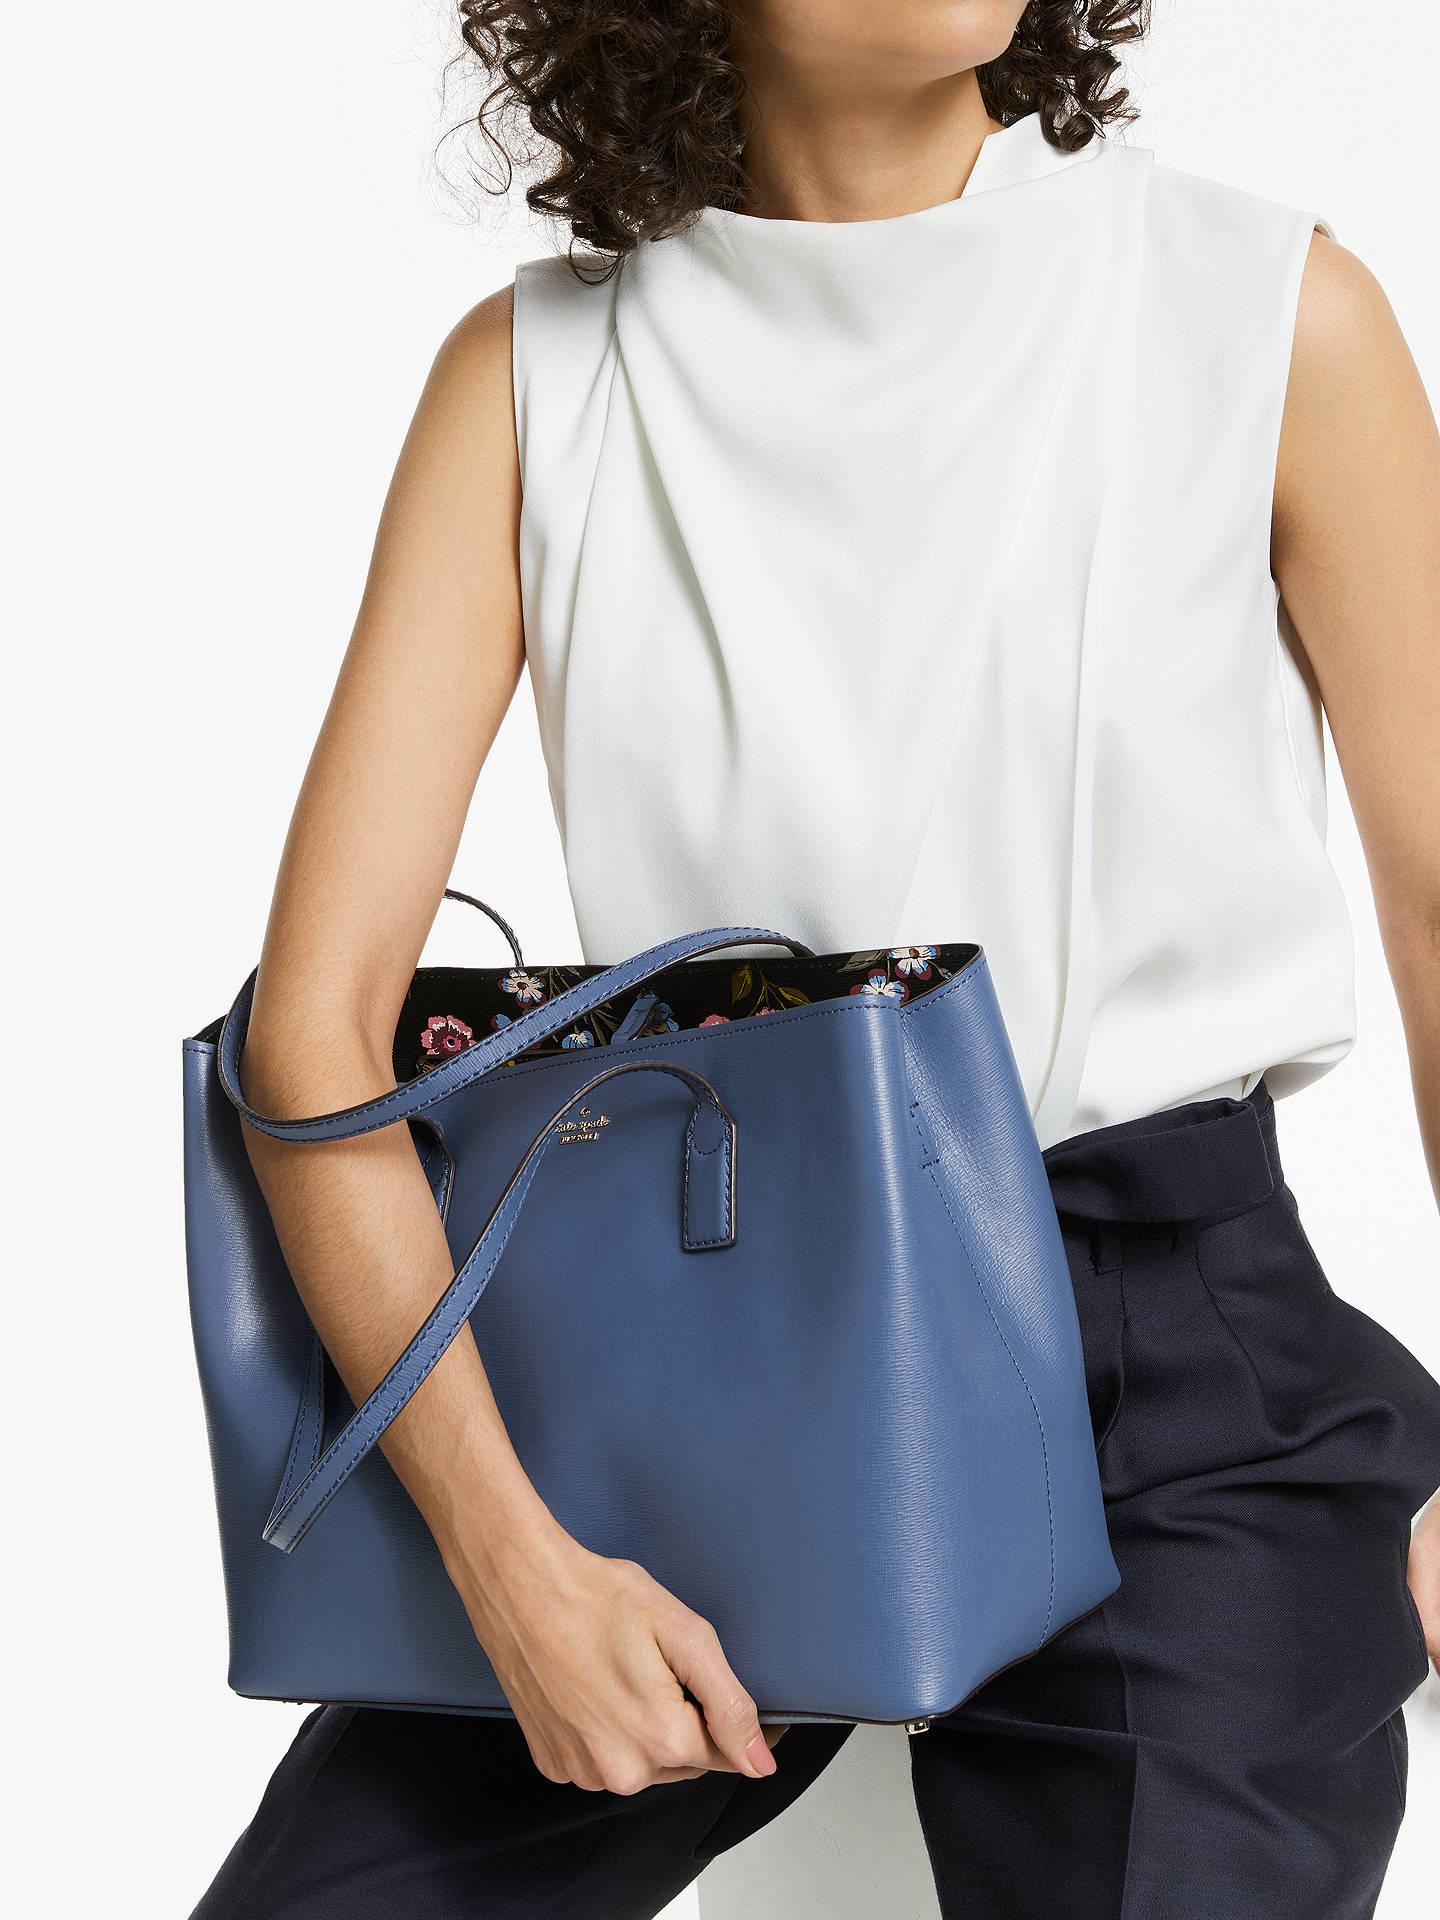 c8b359094263 Buy kate spade new york Hadley Road Dina Leather Handbag